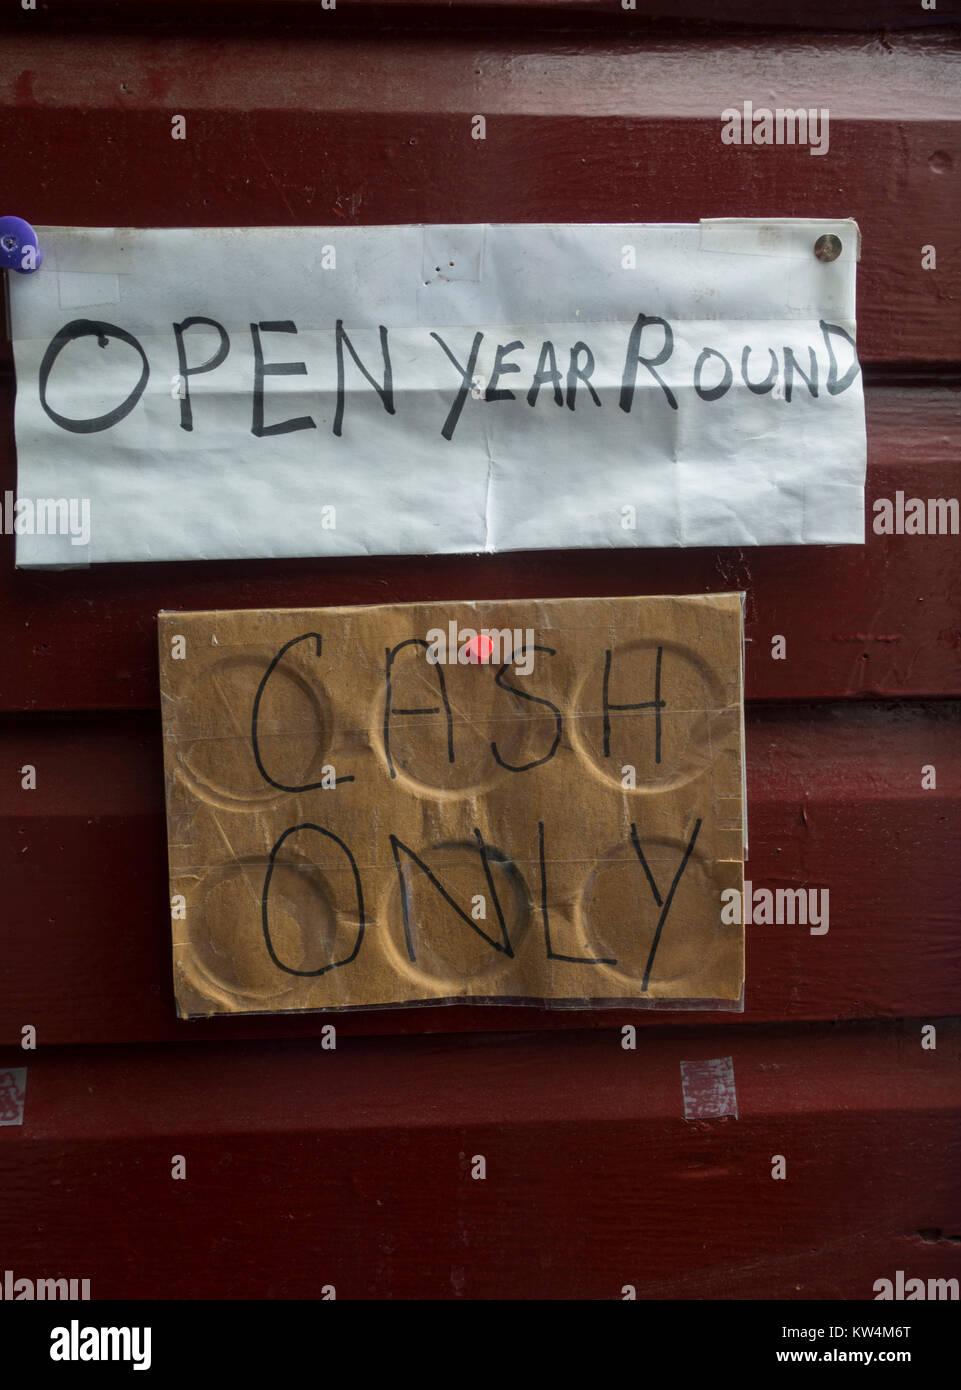 open year round sign Troy NY - Stock Image